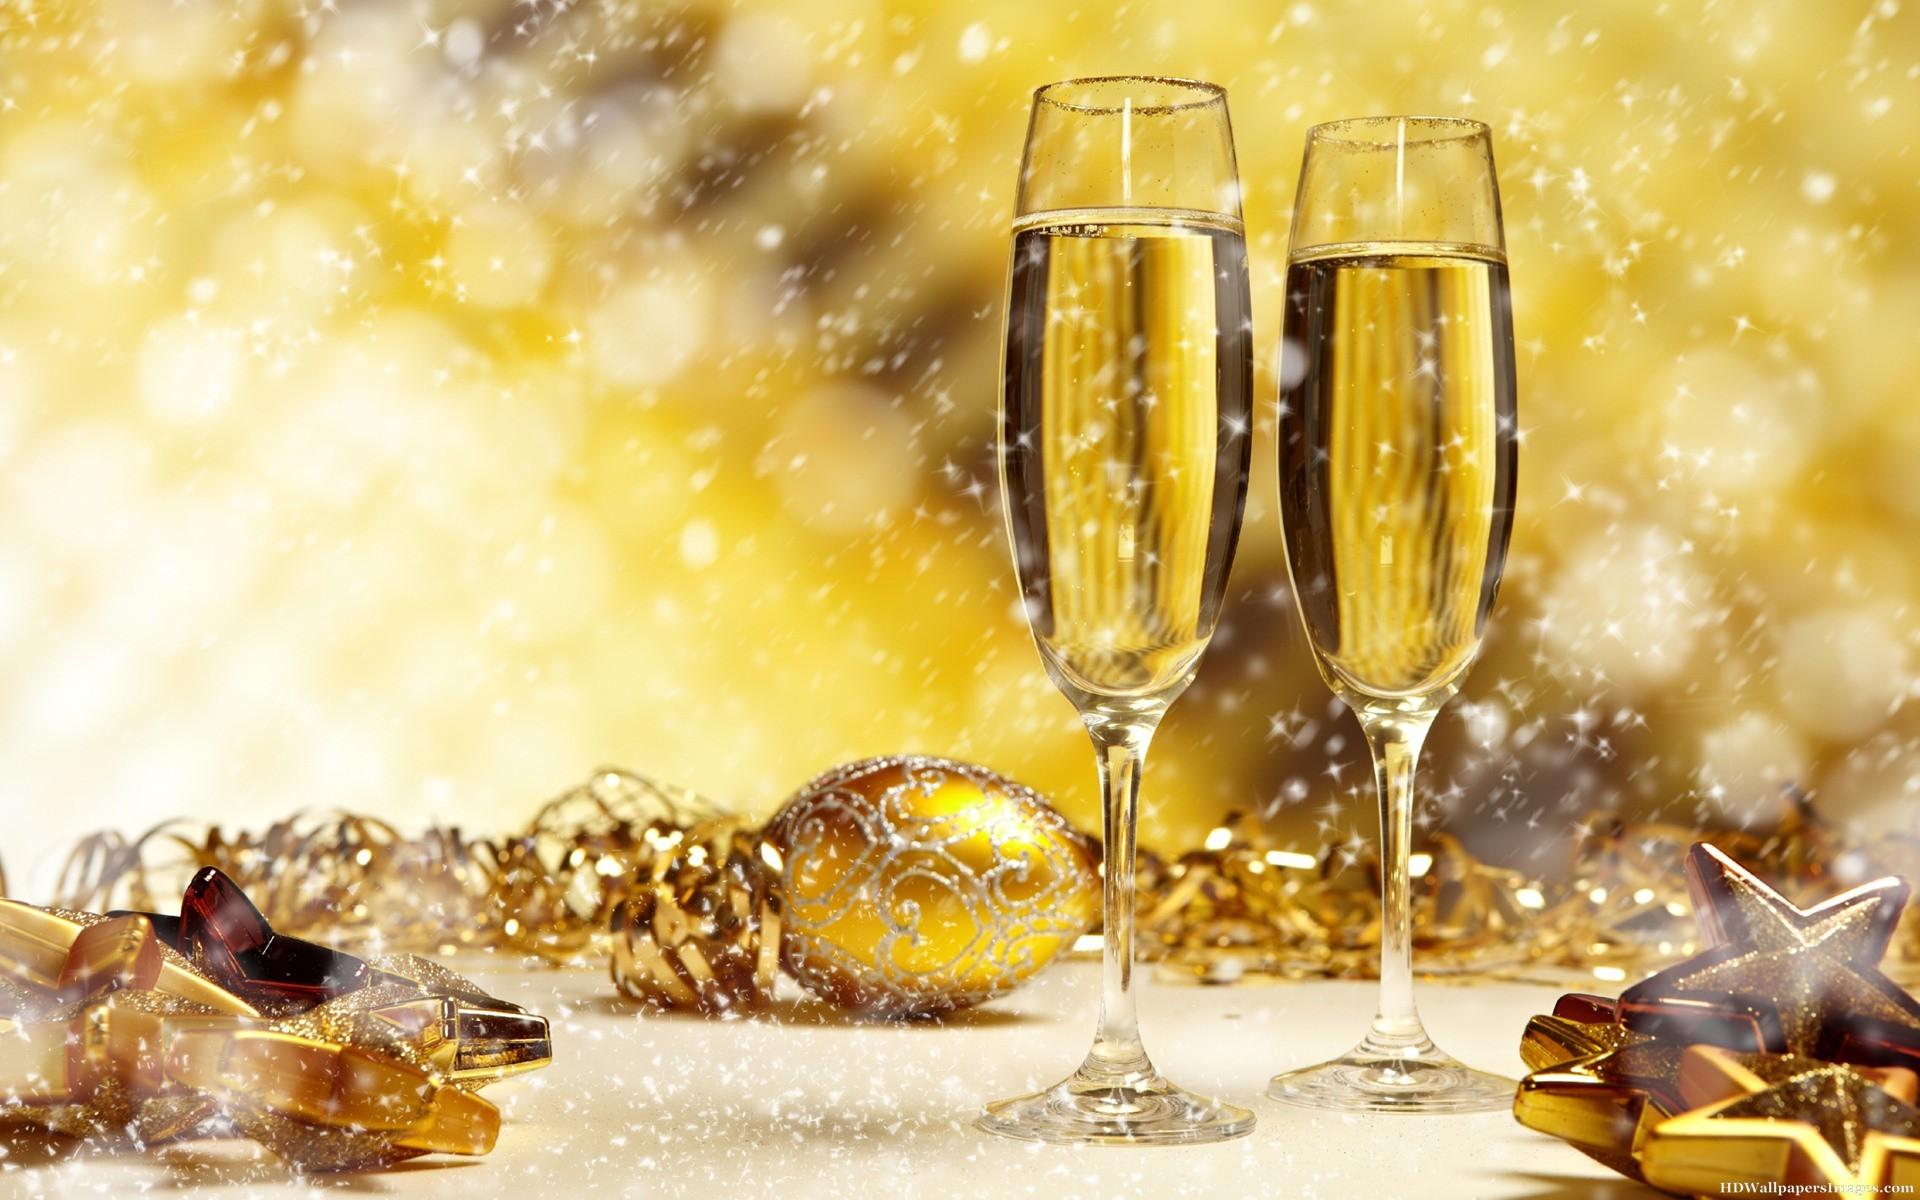 Christmas-Champagne-Desktop-Images